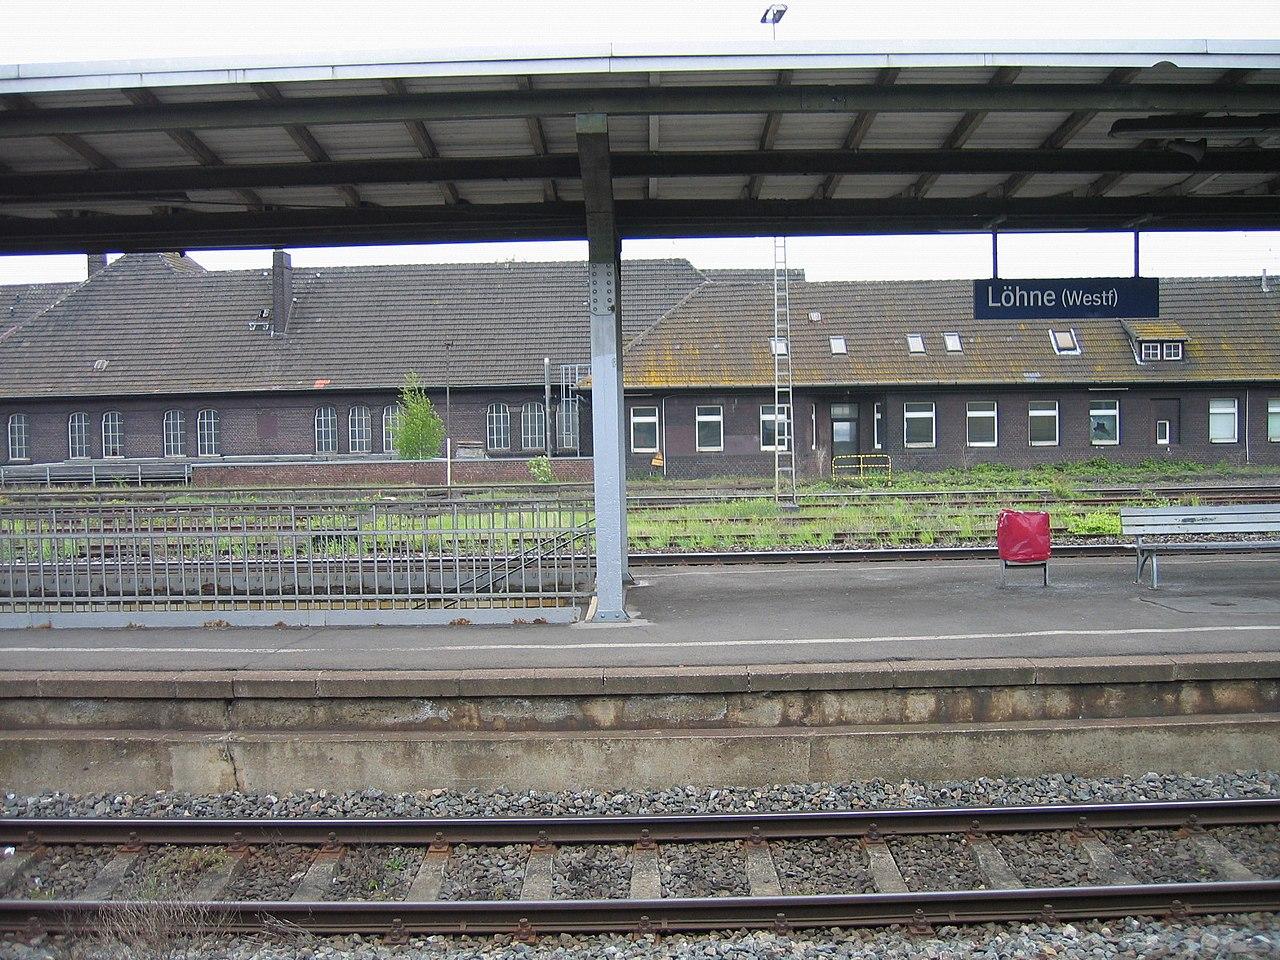 Bahnhof L Hne file 2010 05 11 löhne hbf 10 jpg wikimedia commons